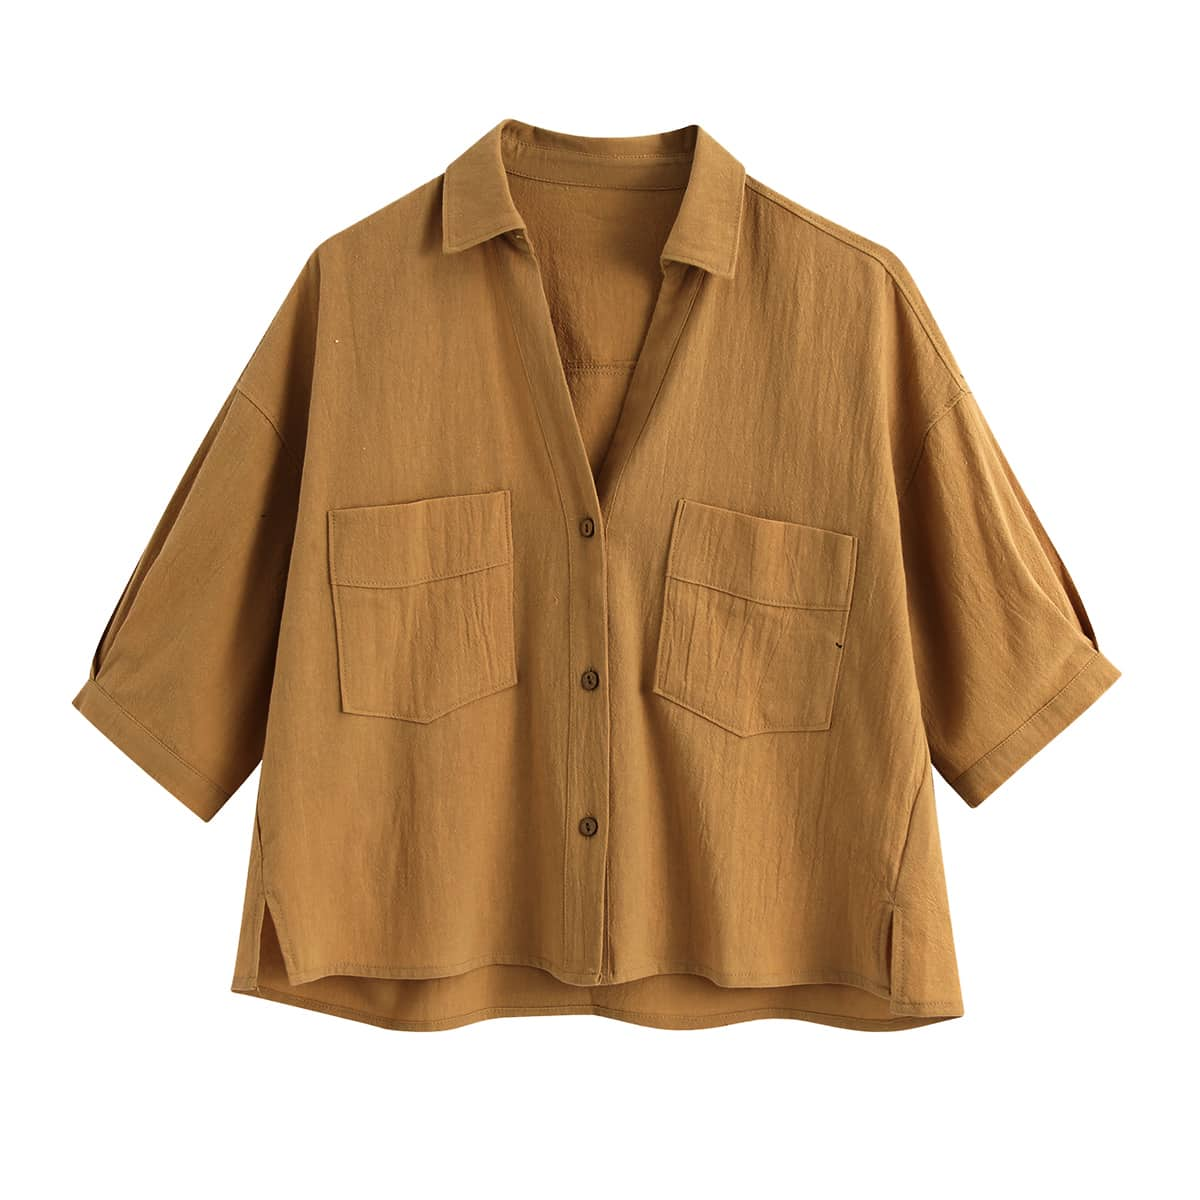 Блузка размера плюс с карманами и разрезом